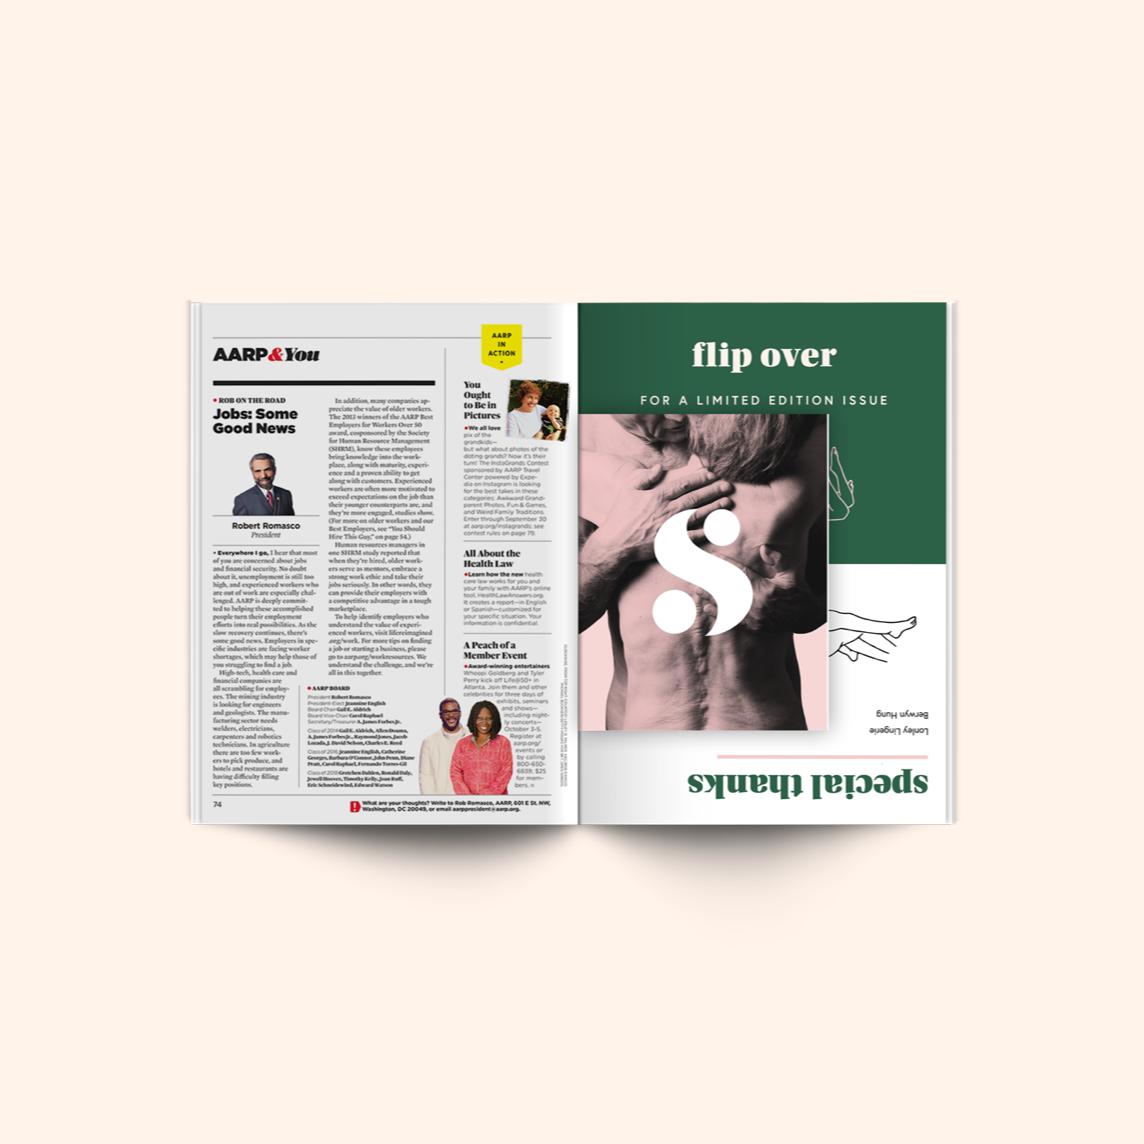 Magazine insert